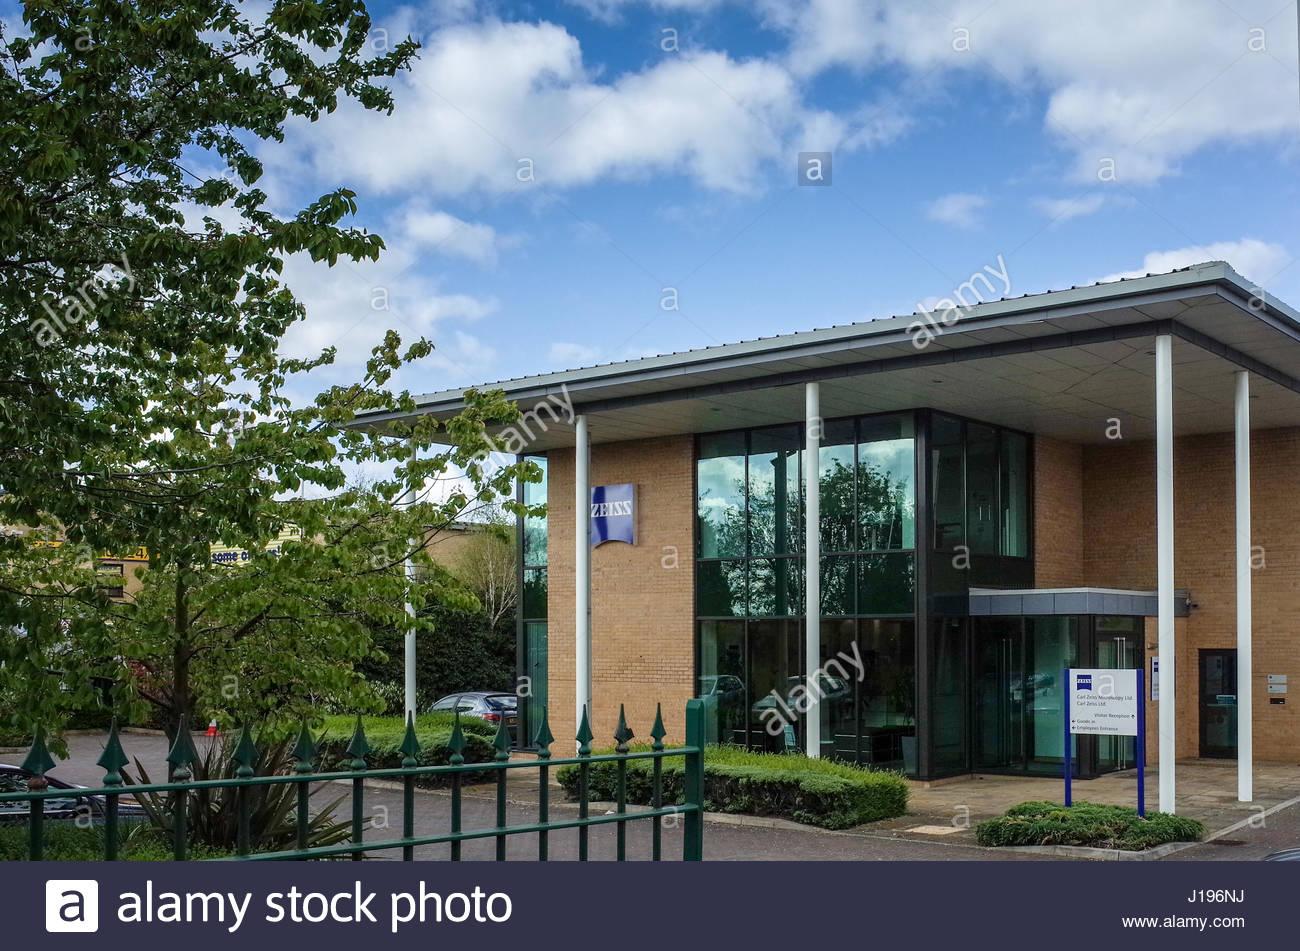 Carl Zeiss Microscopy Ltd, Coldhams Lane, Cambridge UK Stock